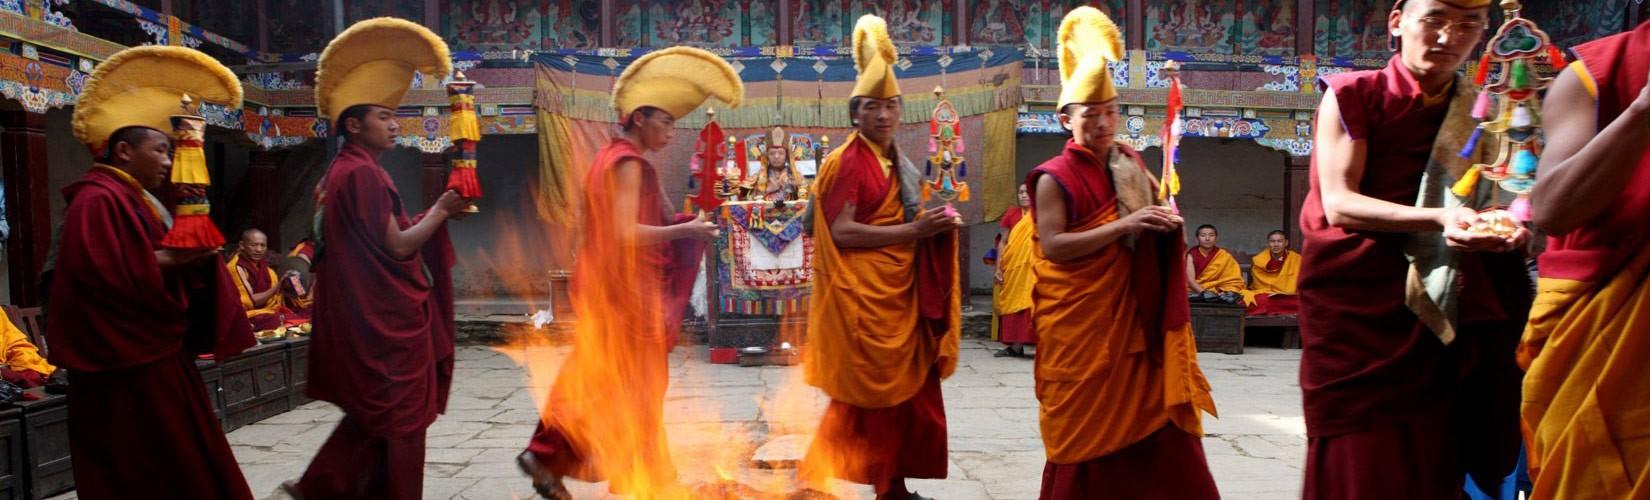 Mani Rimdu Festival celebration in Tengbouche monastery